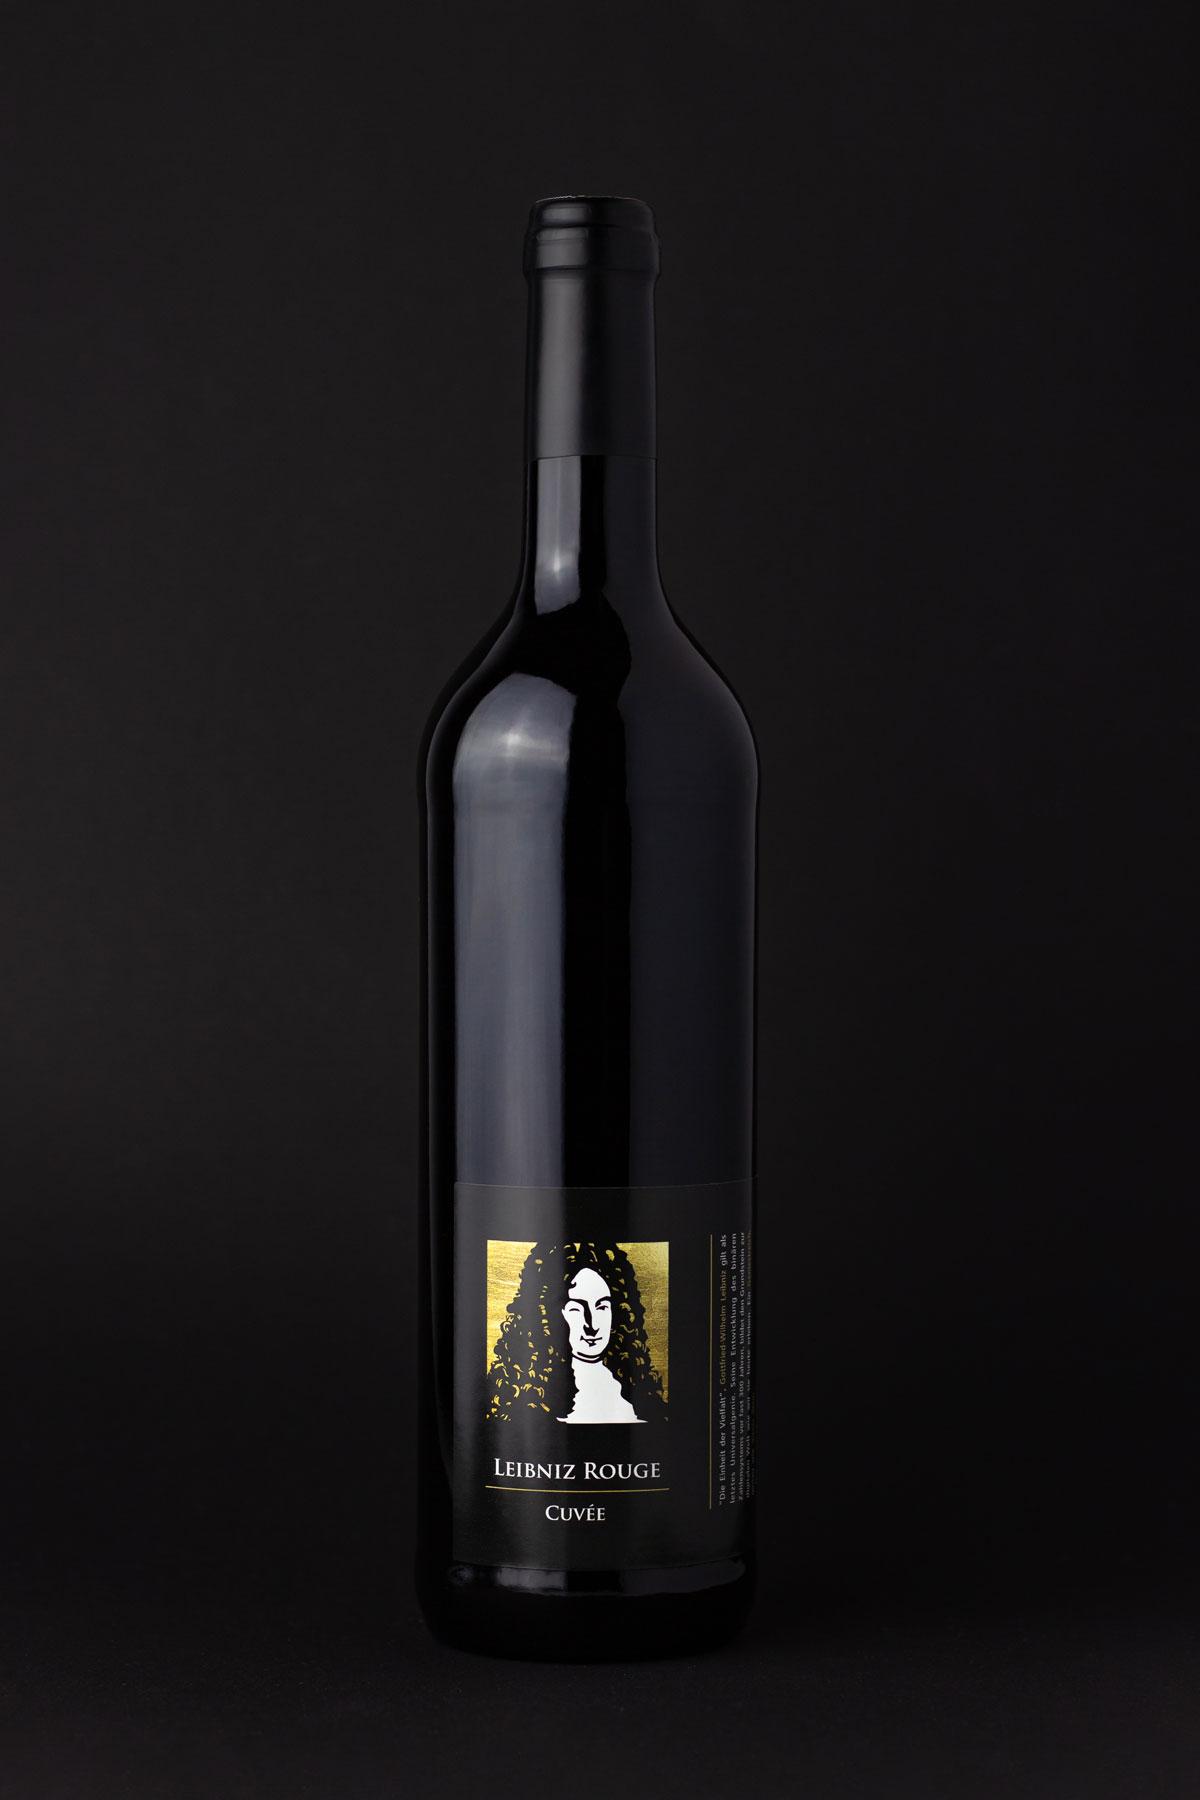 Leibniz Rouge